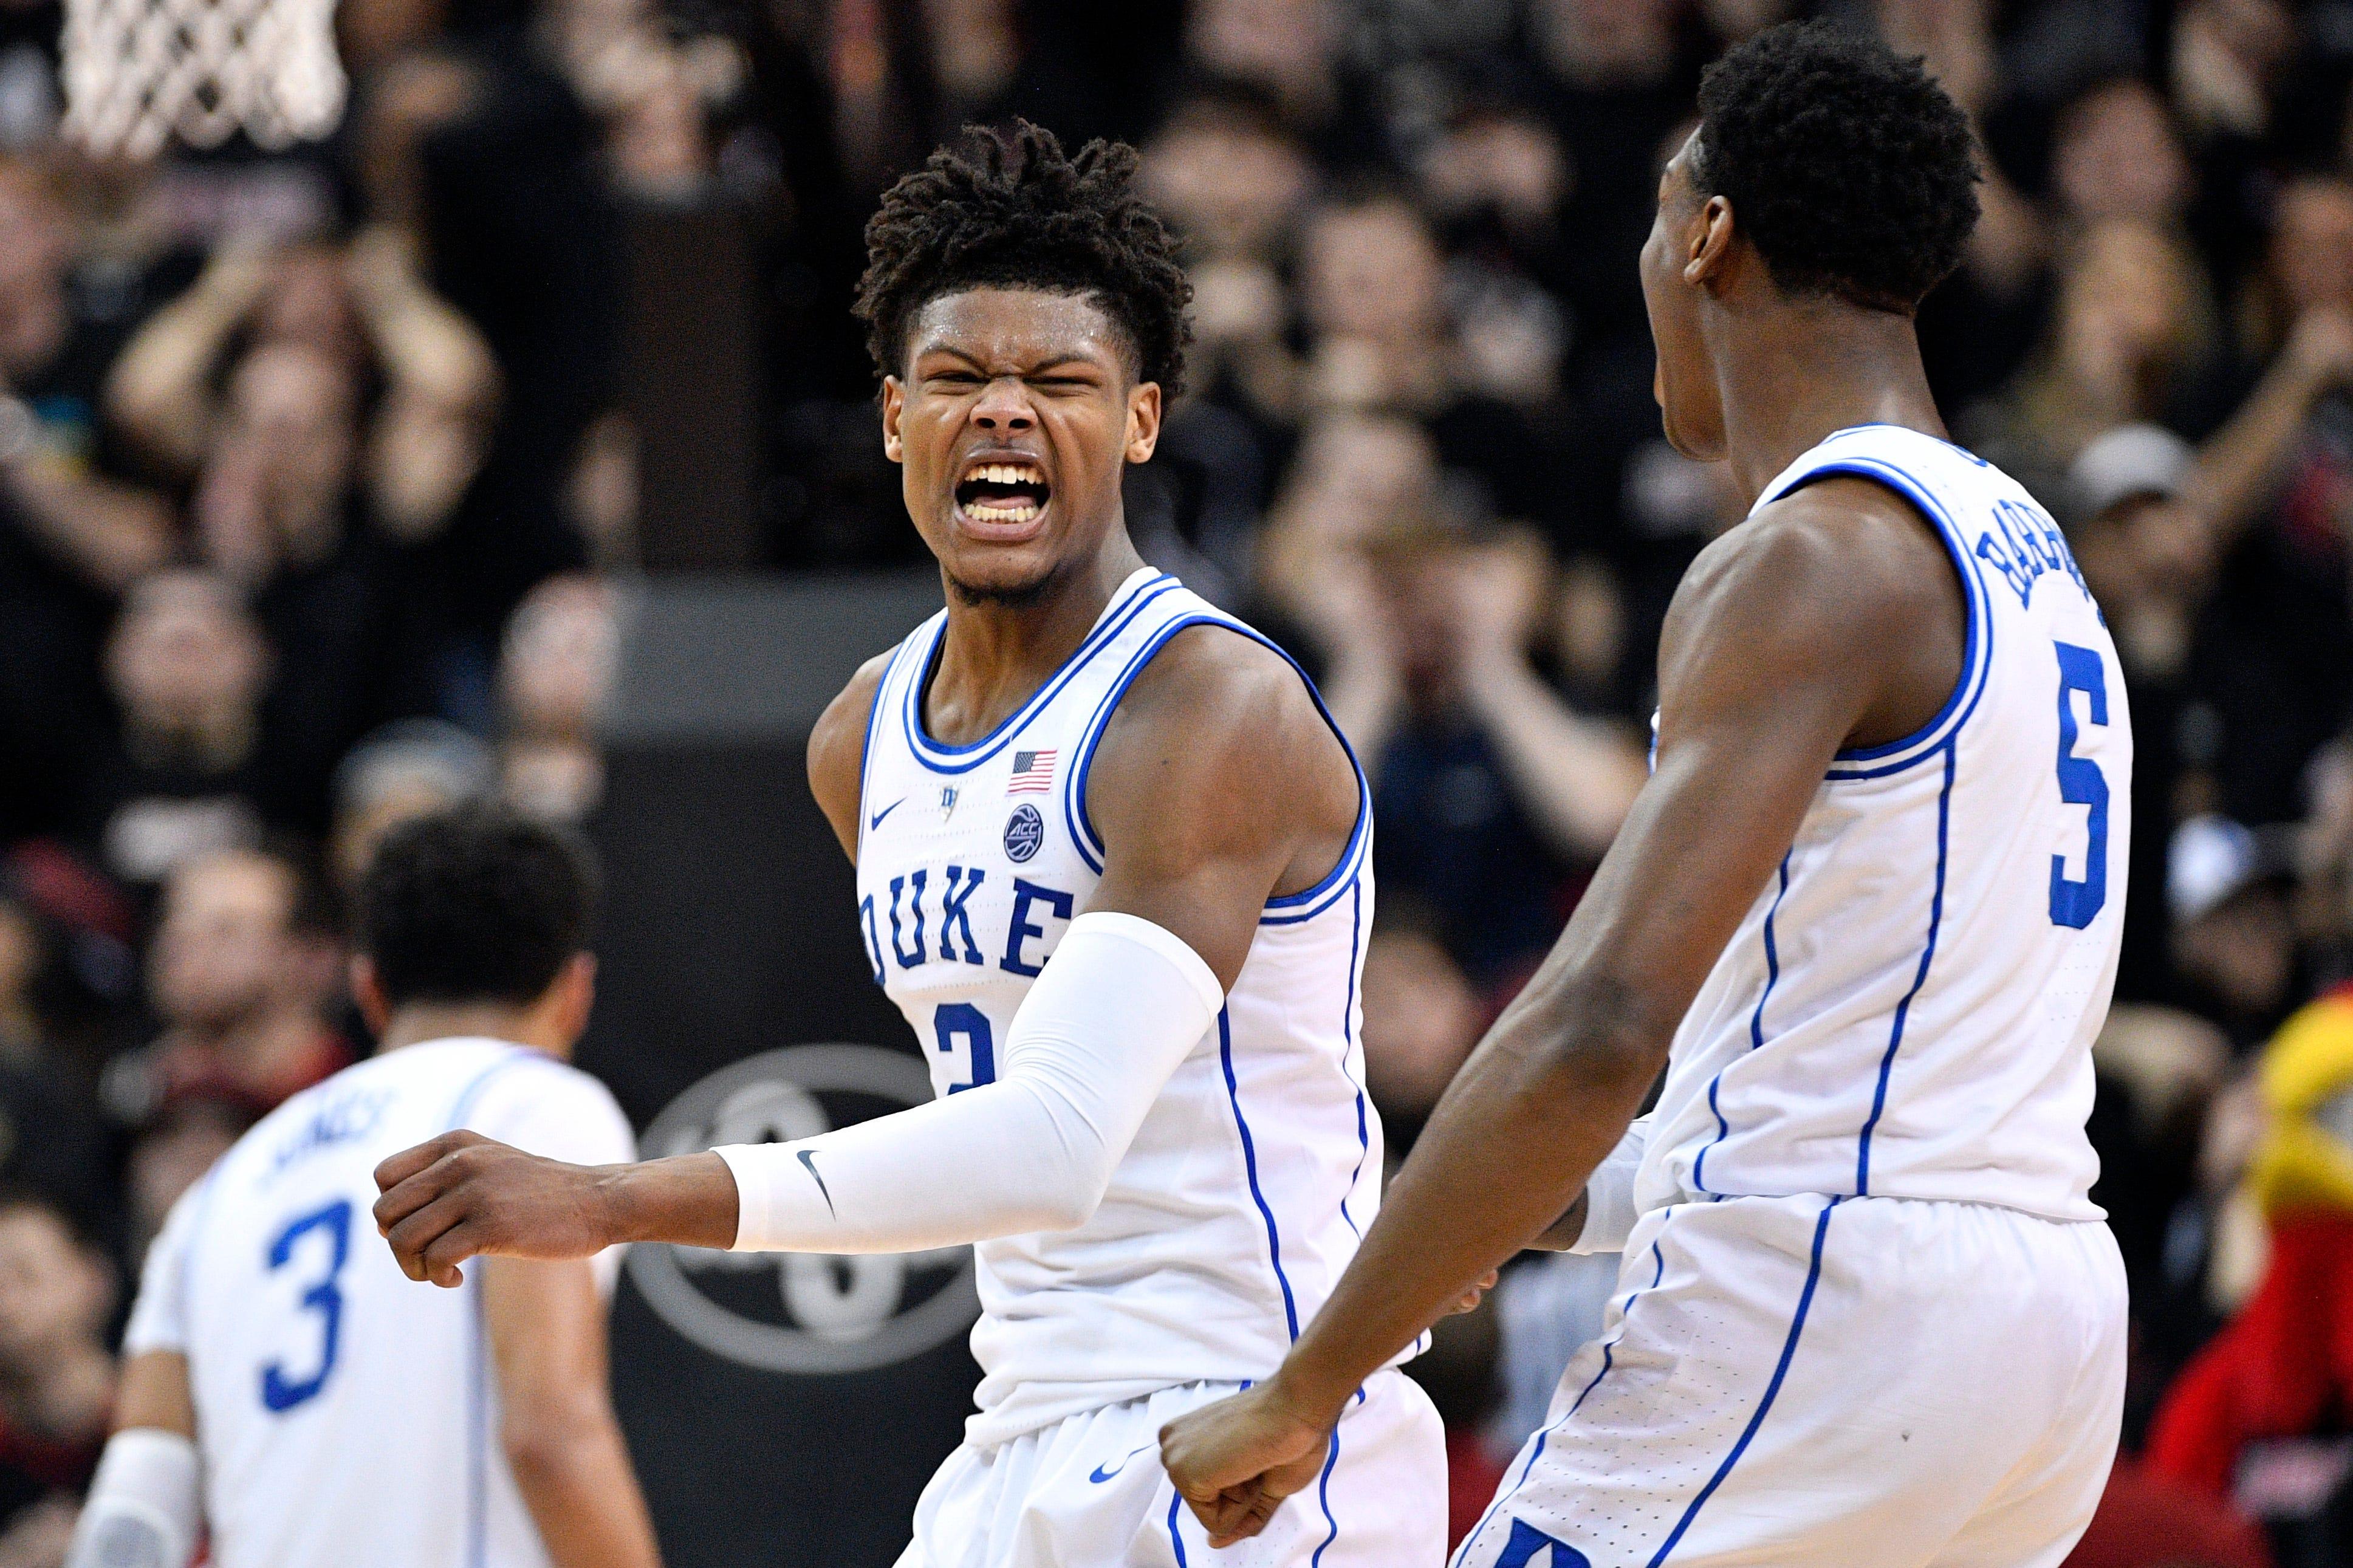 No. 2 Duke stuns No. 20 Louisville with historic 23-point comeback